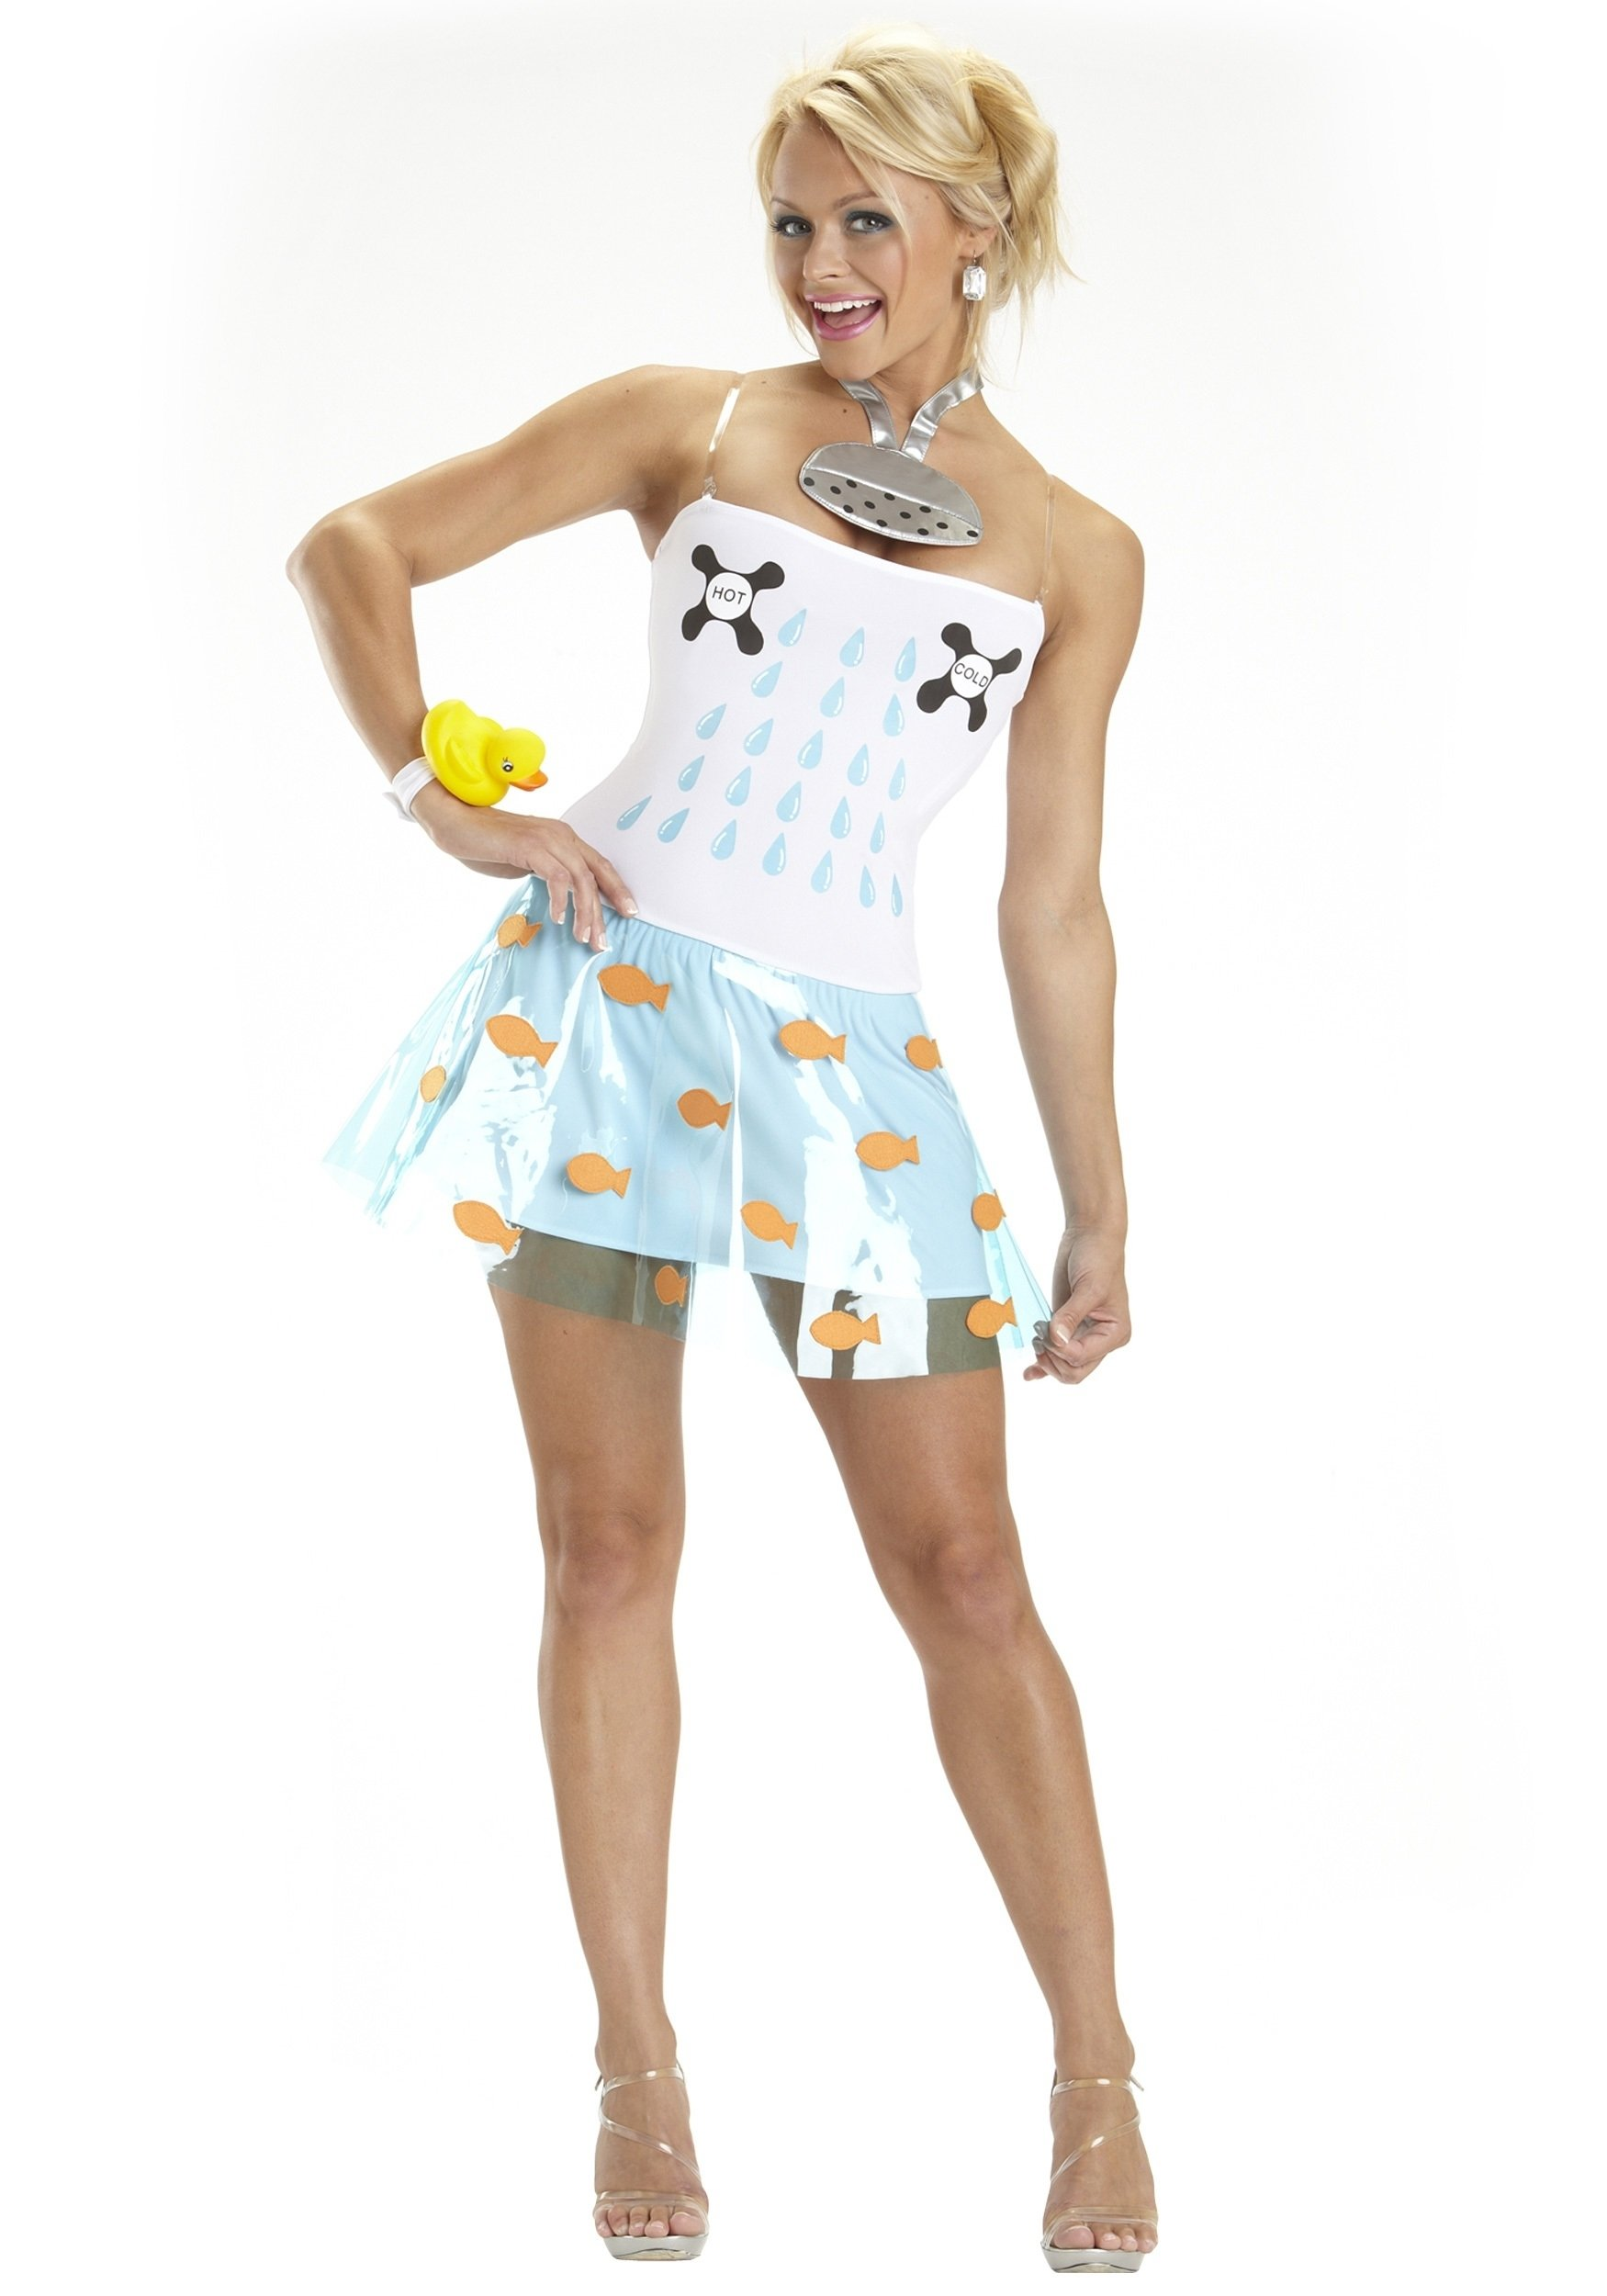 10 Awesome Creative Halloween Costume Ideas Women 65 funny halloween costume ideas women 12 funny halloween costume 2020